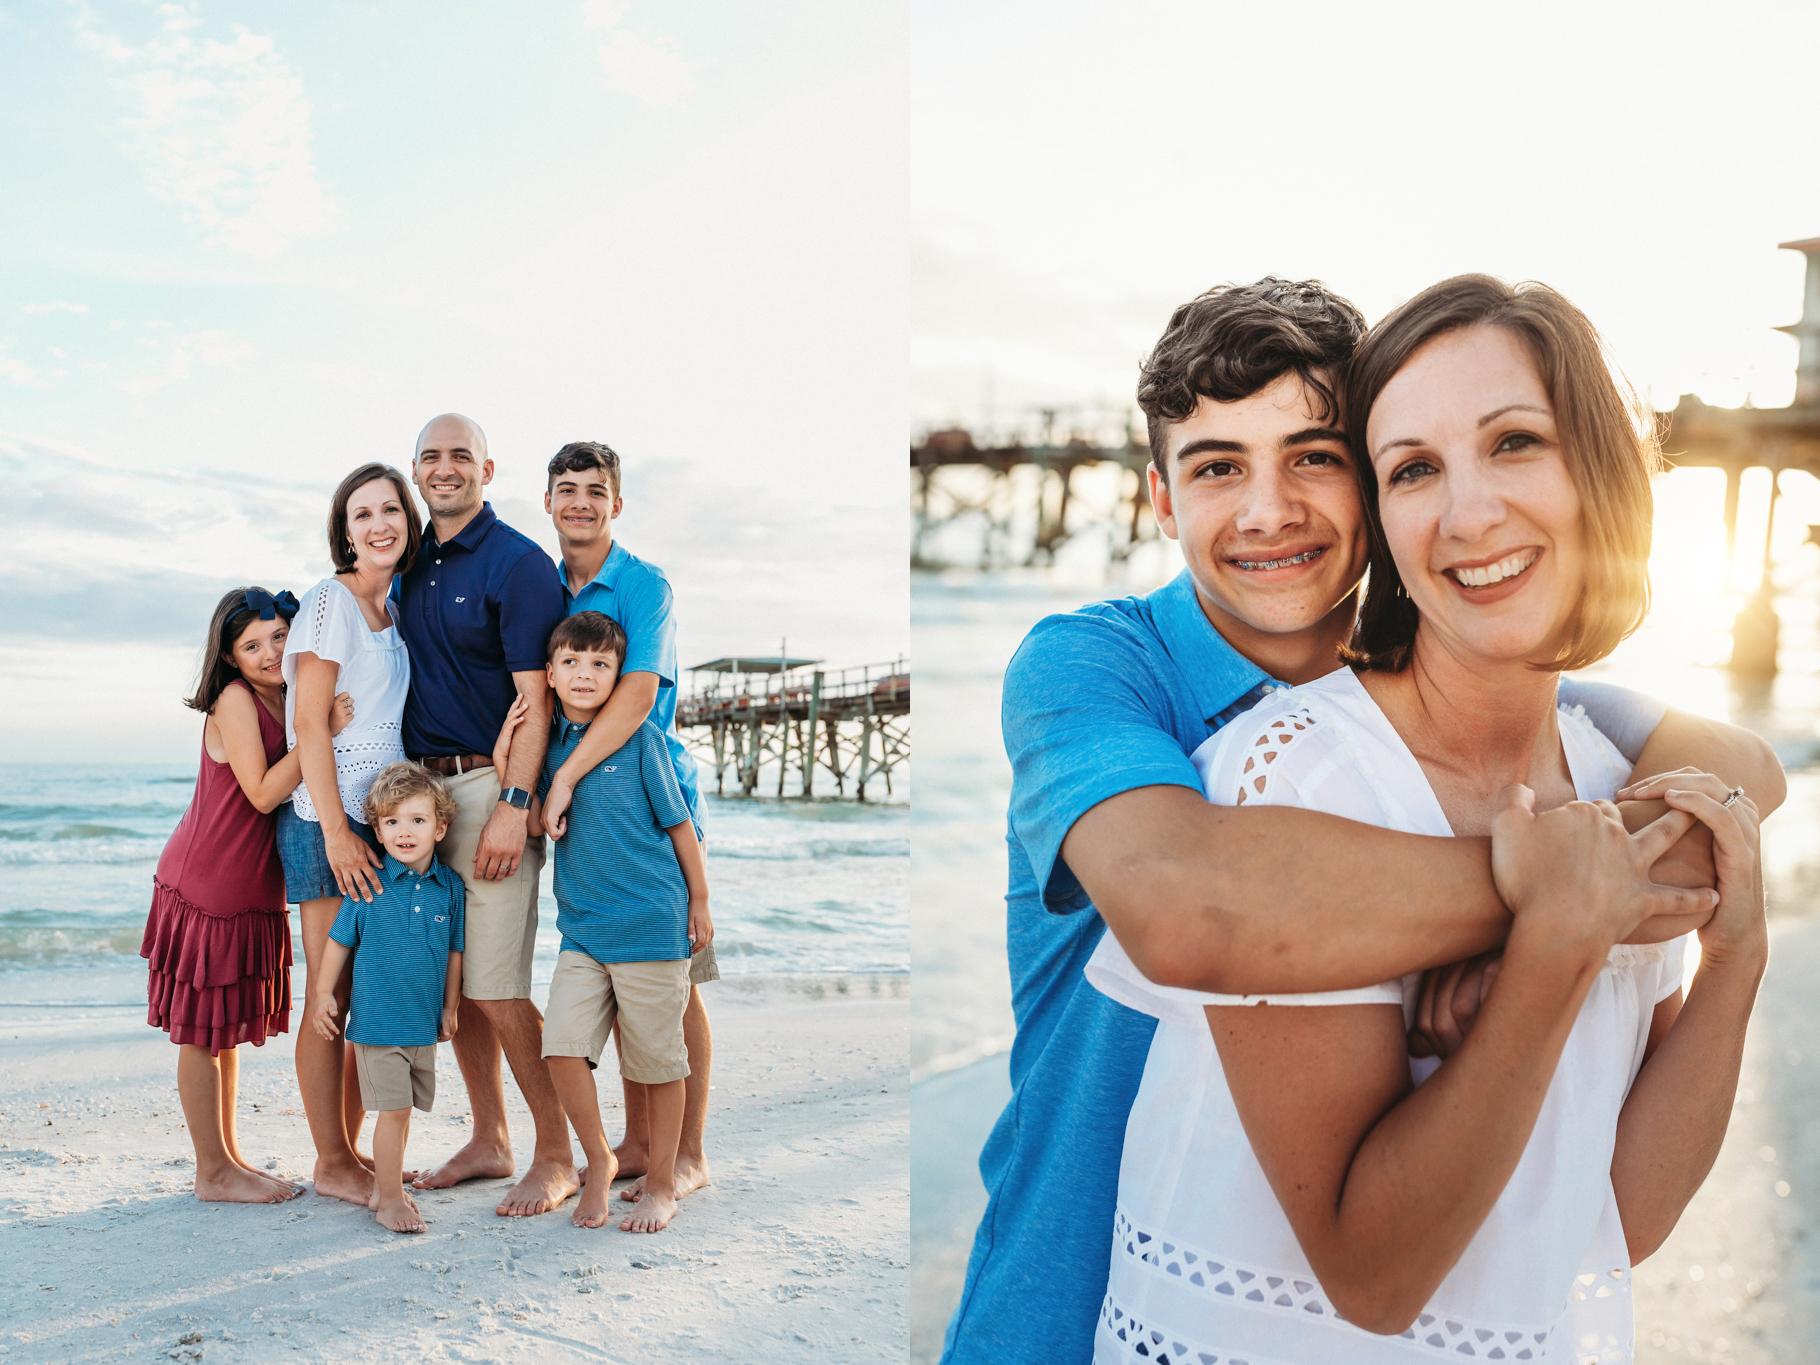 Tampa Family Photographer_Jennifer Kielich Photography_Niki Harris for blog 101.jpg